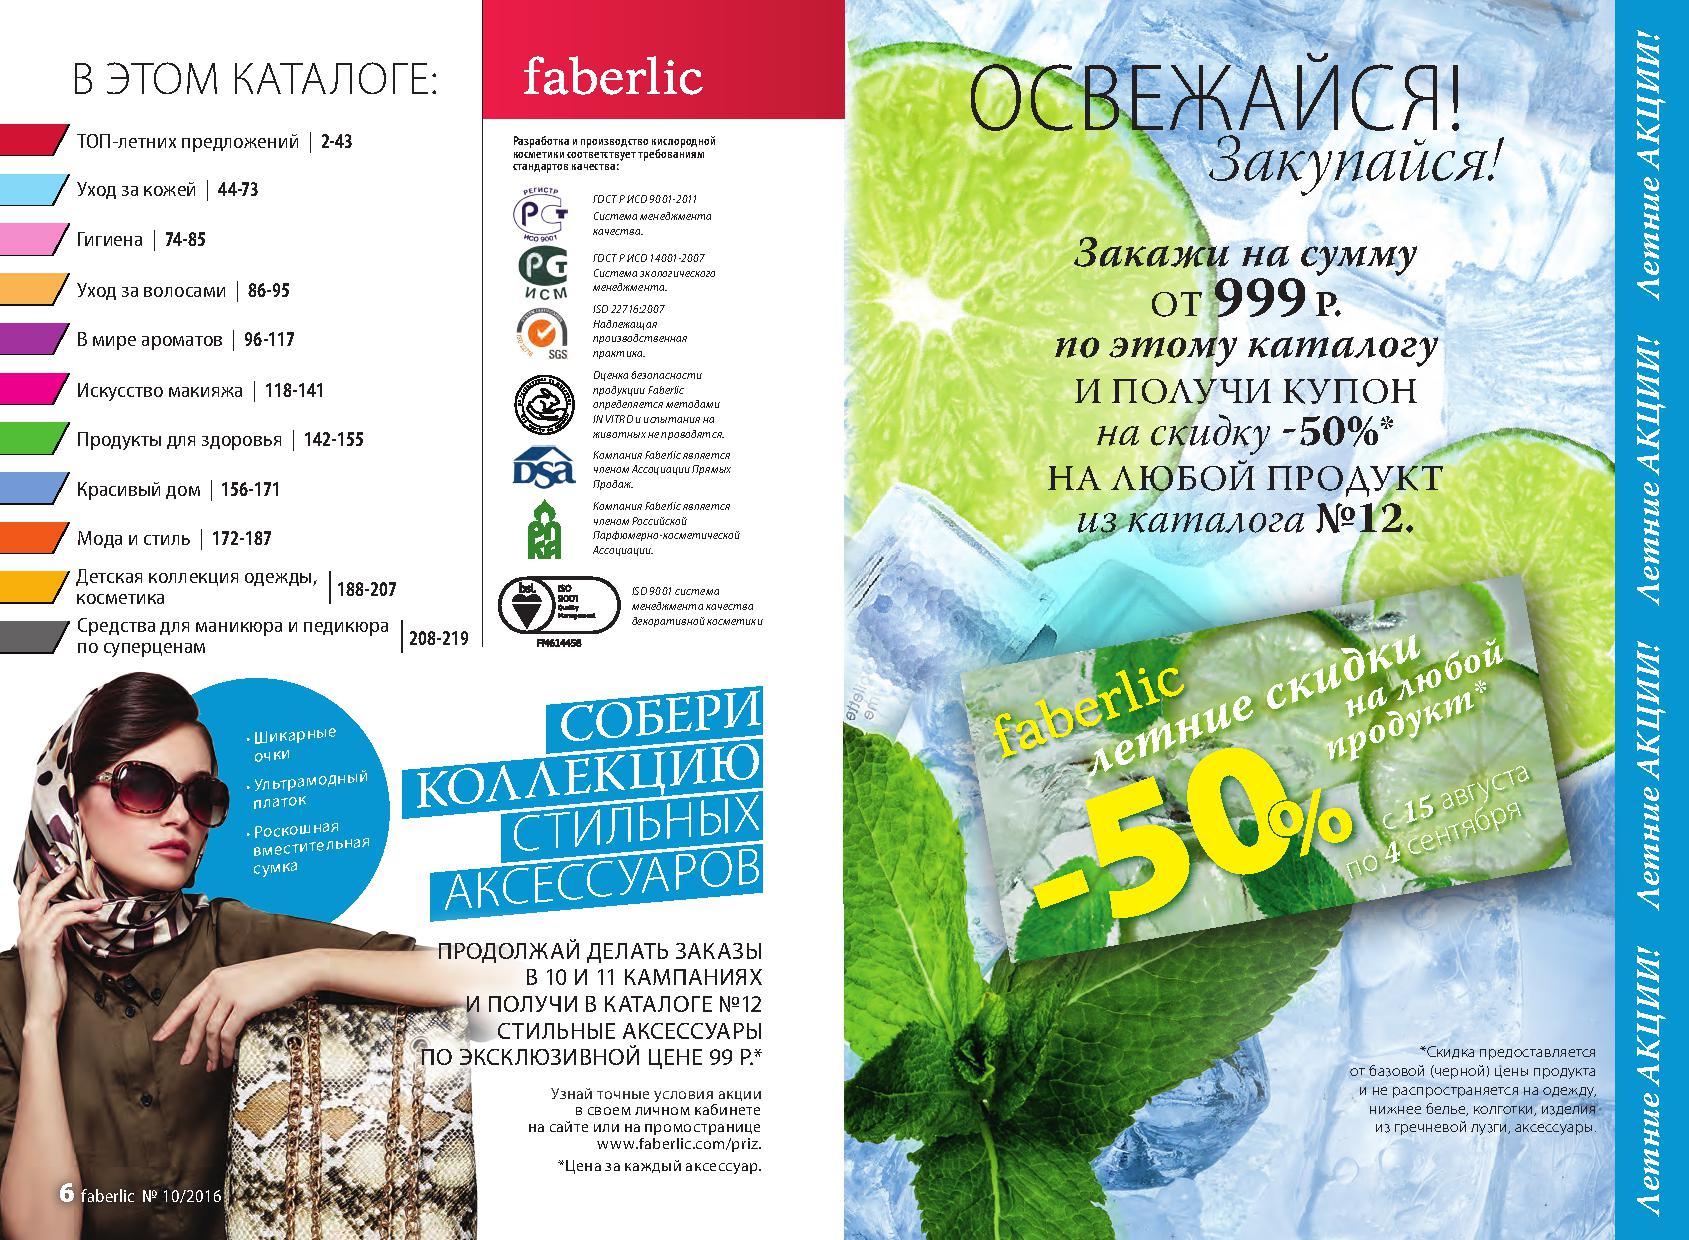 Следующий каталог Faberlic (Фаберлик), новый каталог on-line, каталог Фаберлик, скачать бесплатно каталог Faberlic, полная версия каталога, листать каталог Faberlic (Фаберлик)